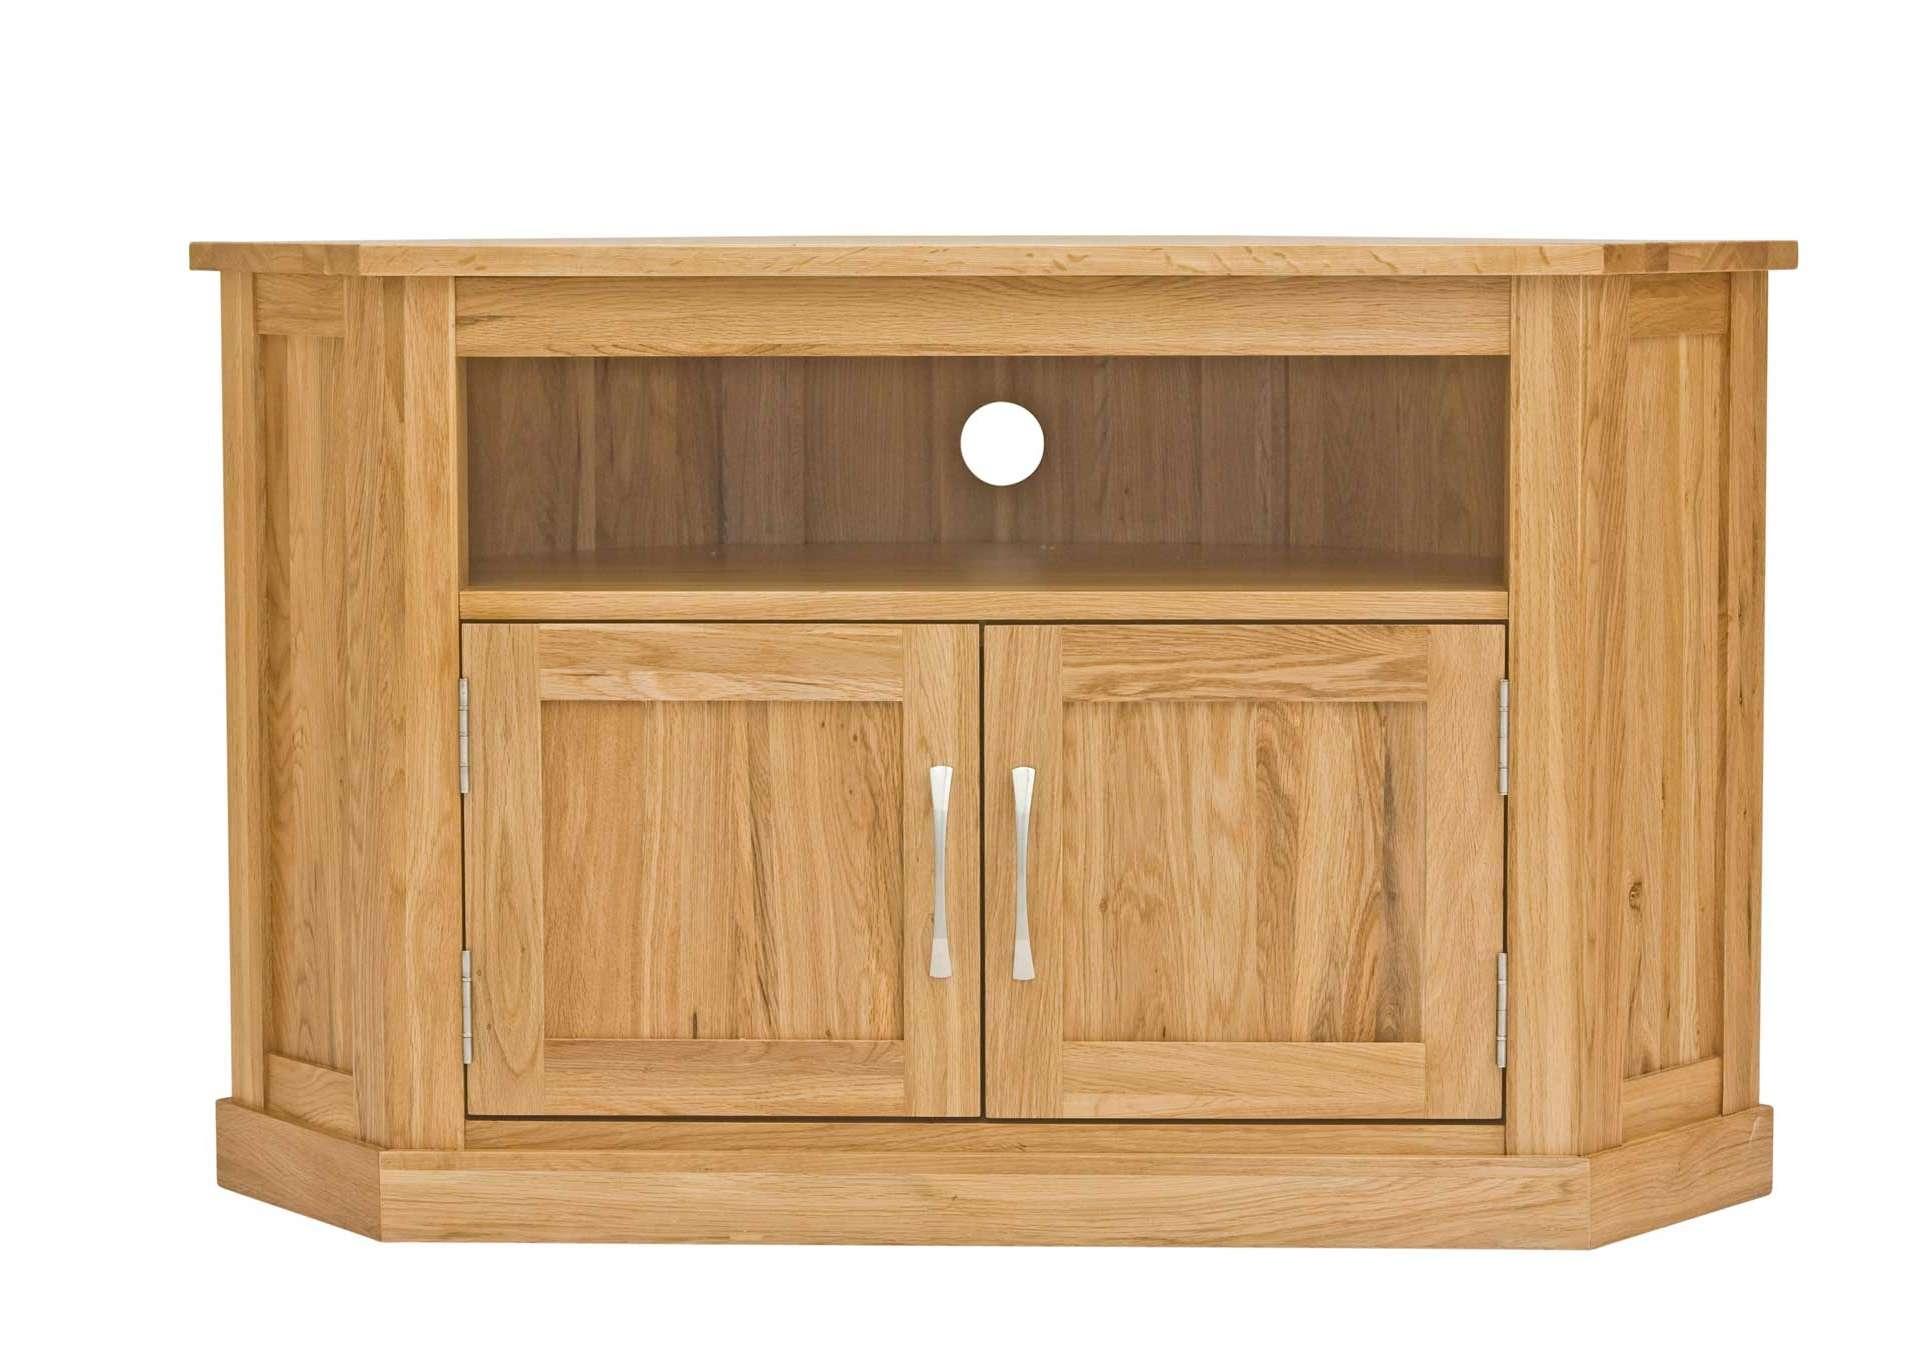 Classic Oak Corner Television Cabinet | Hampshire Furniture In Dark Wood Corner Tv Cabinets (View 2 of 20)